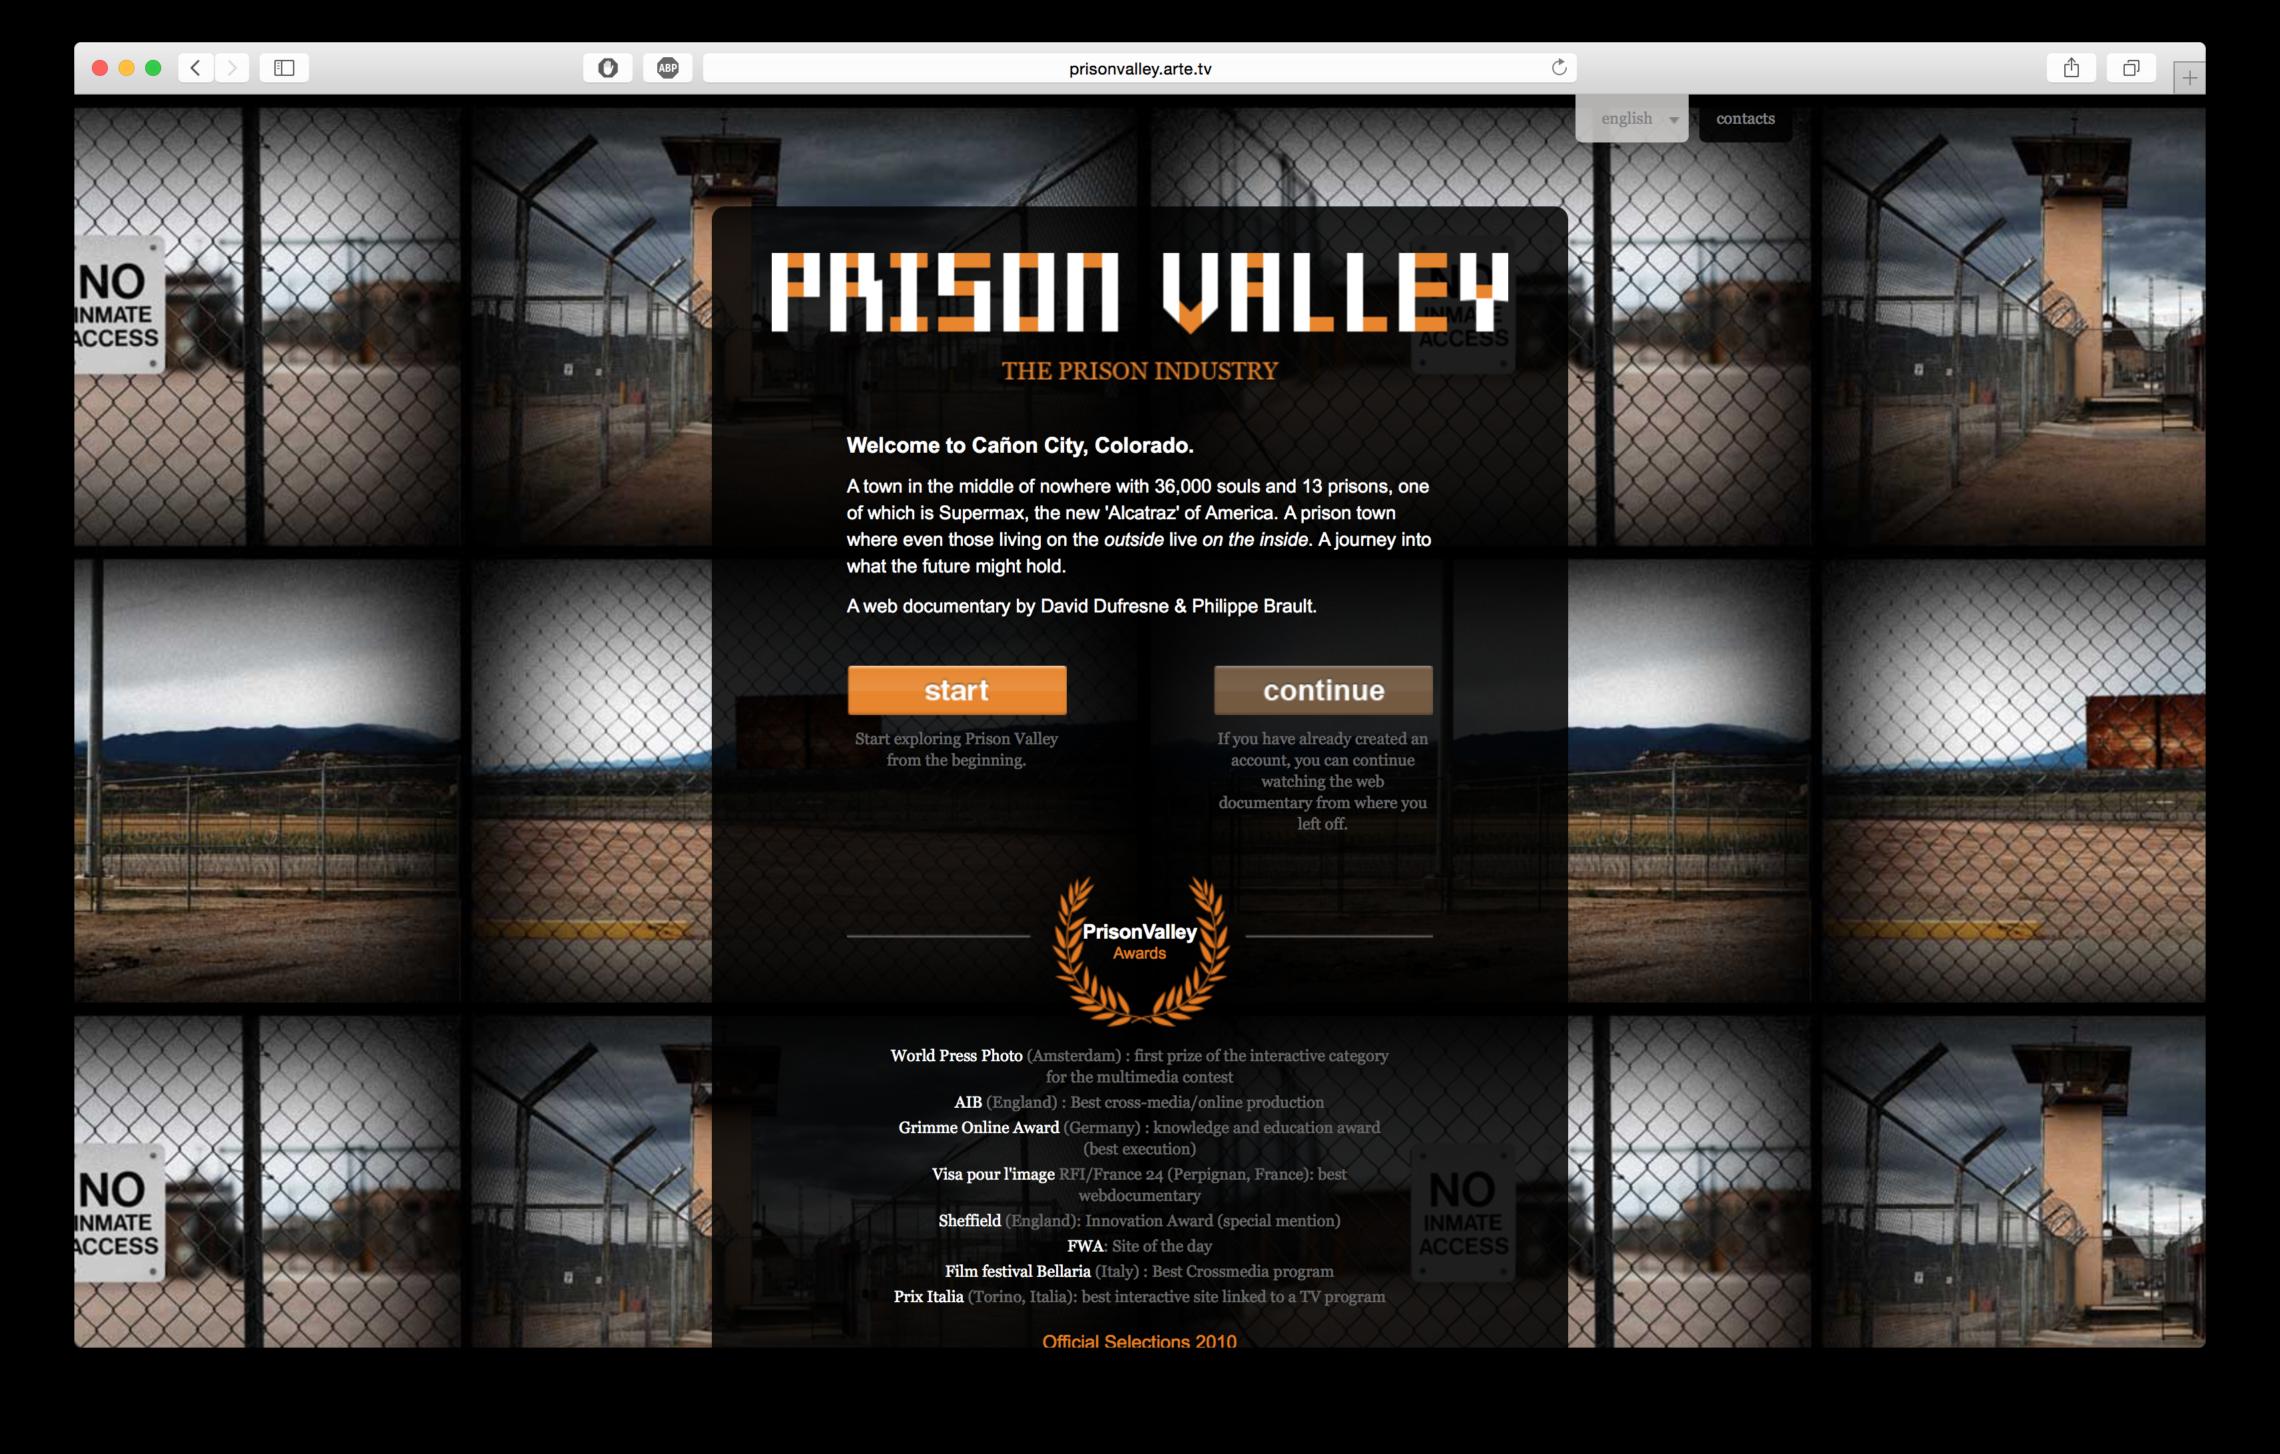 Prison valley_1